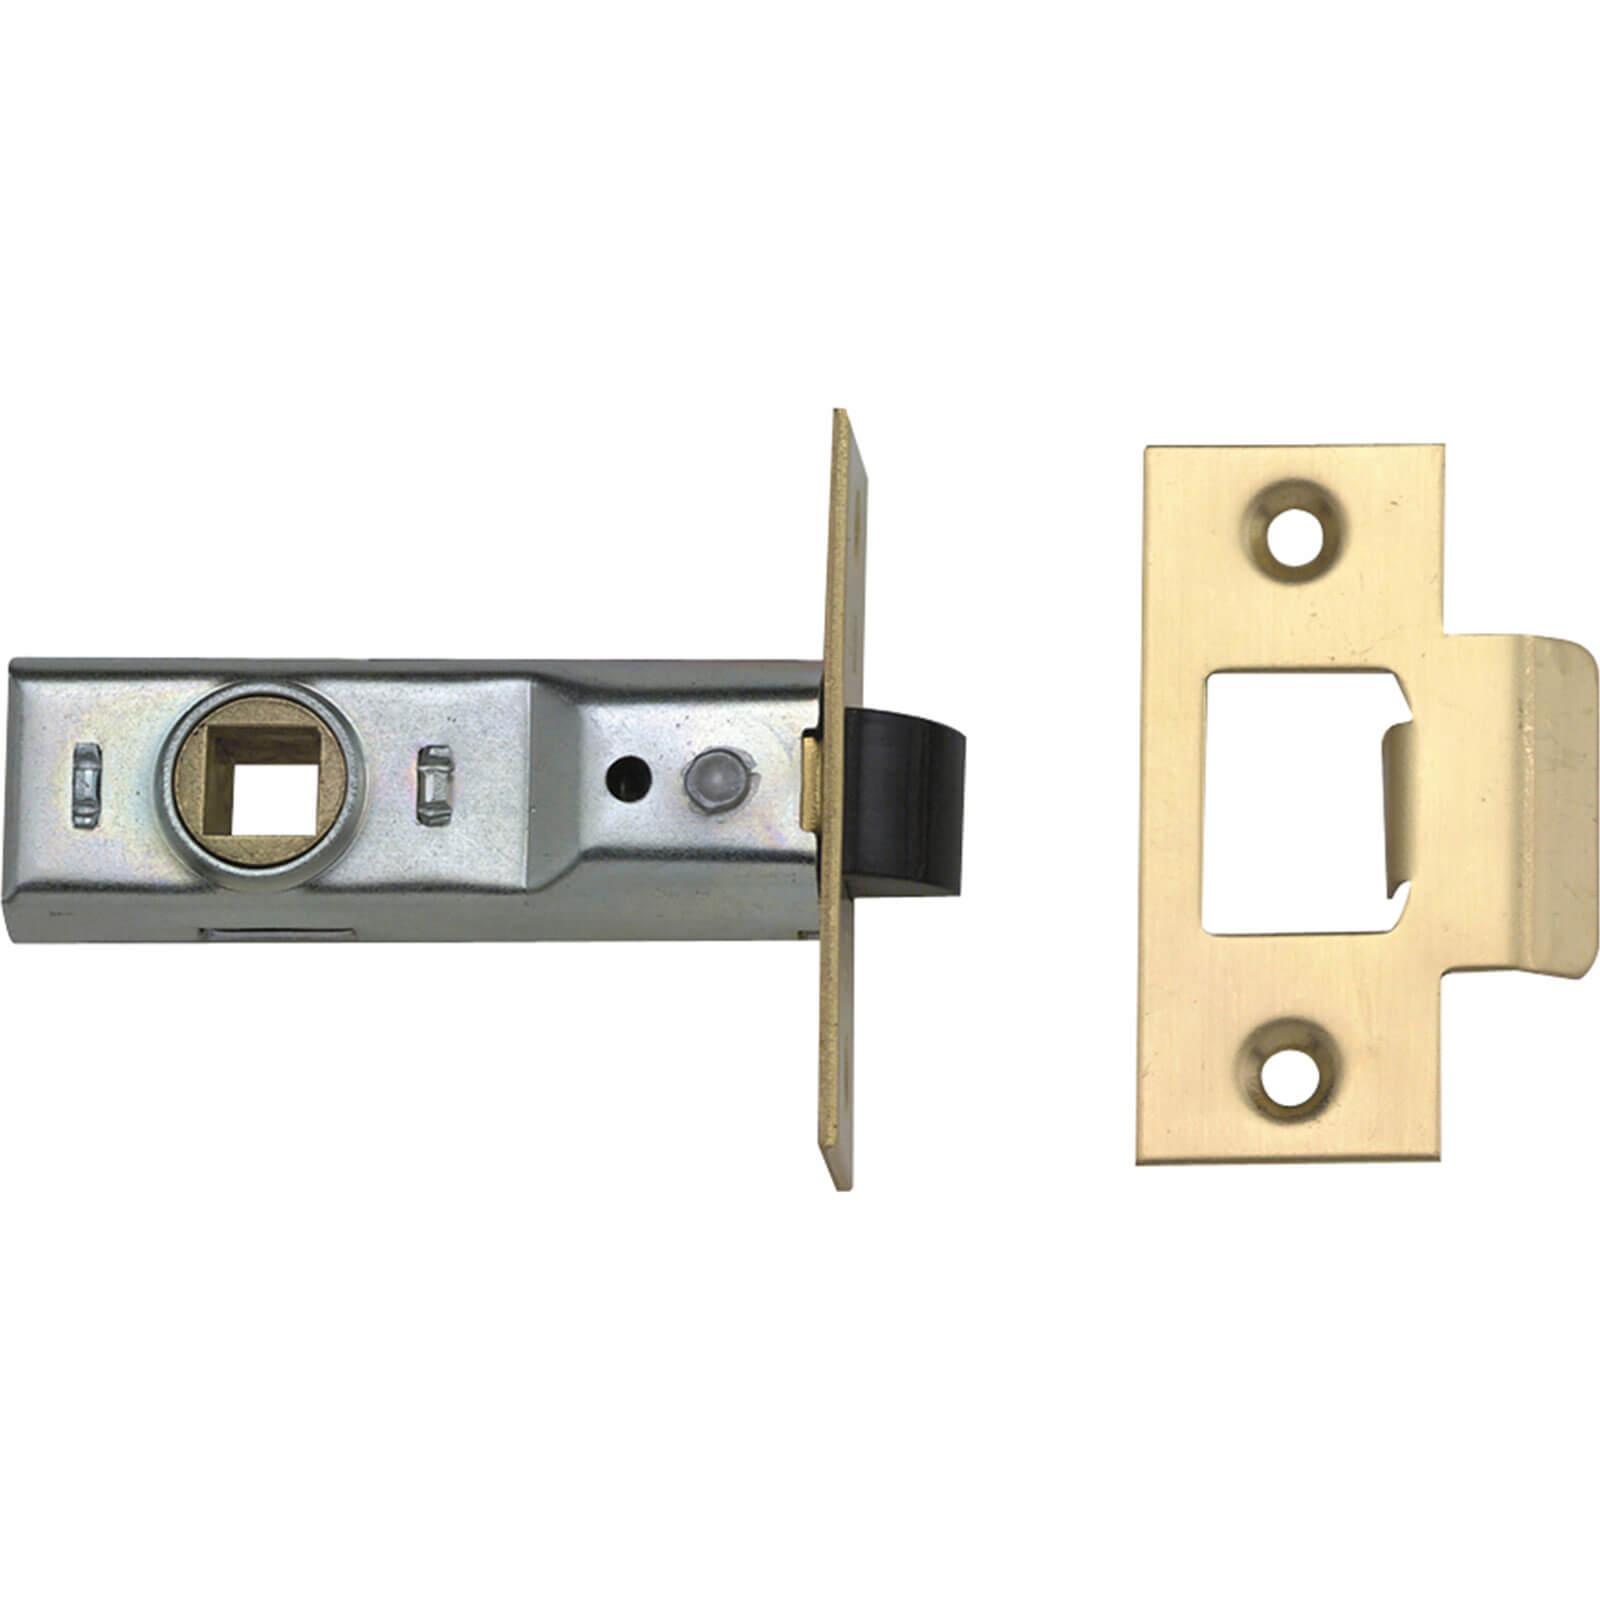 Yale Locks M888 Rebated Mortice Latch 76mm / 3